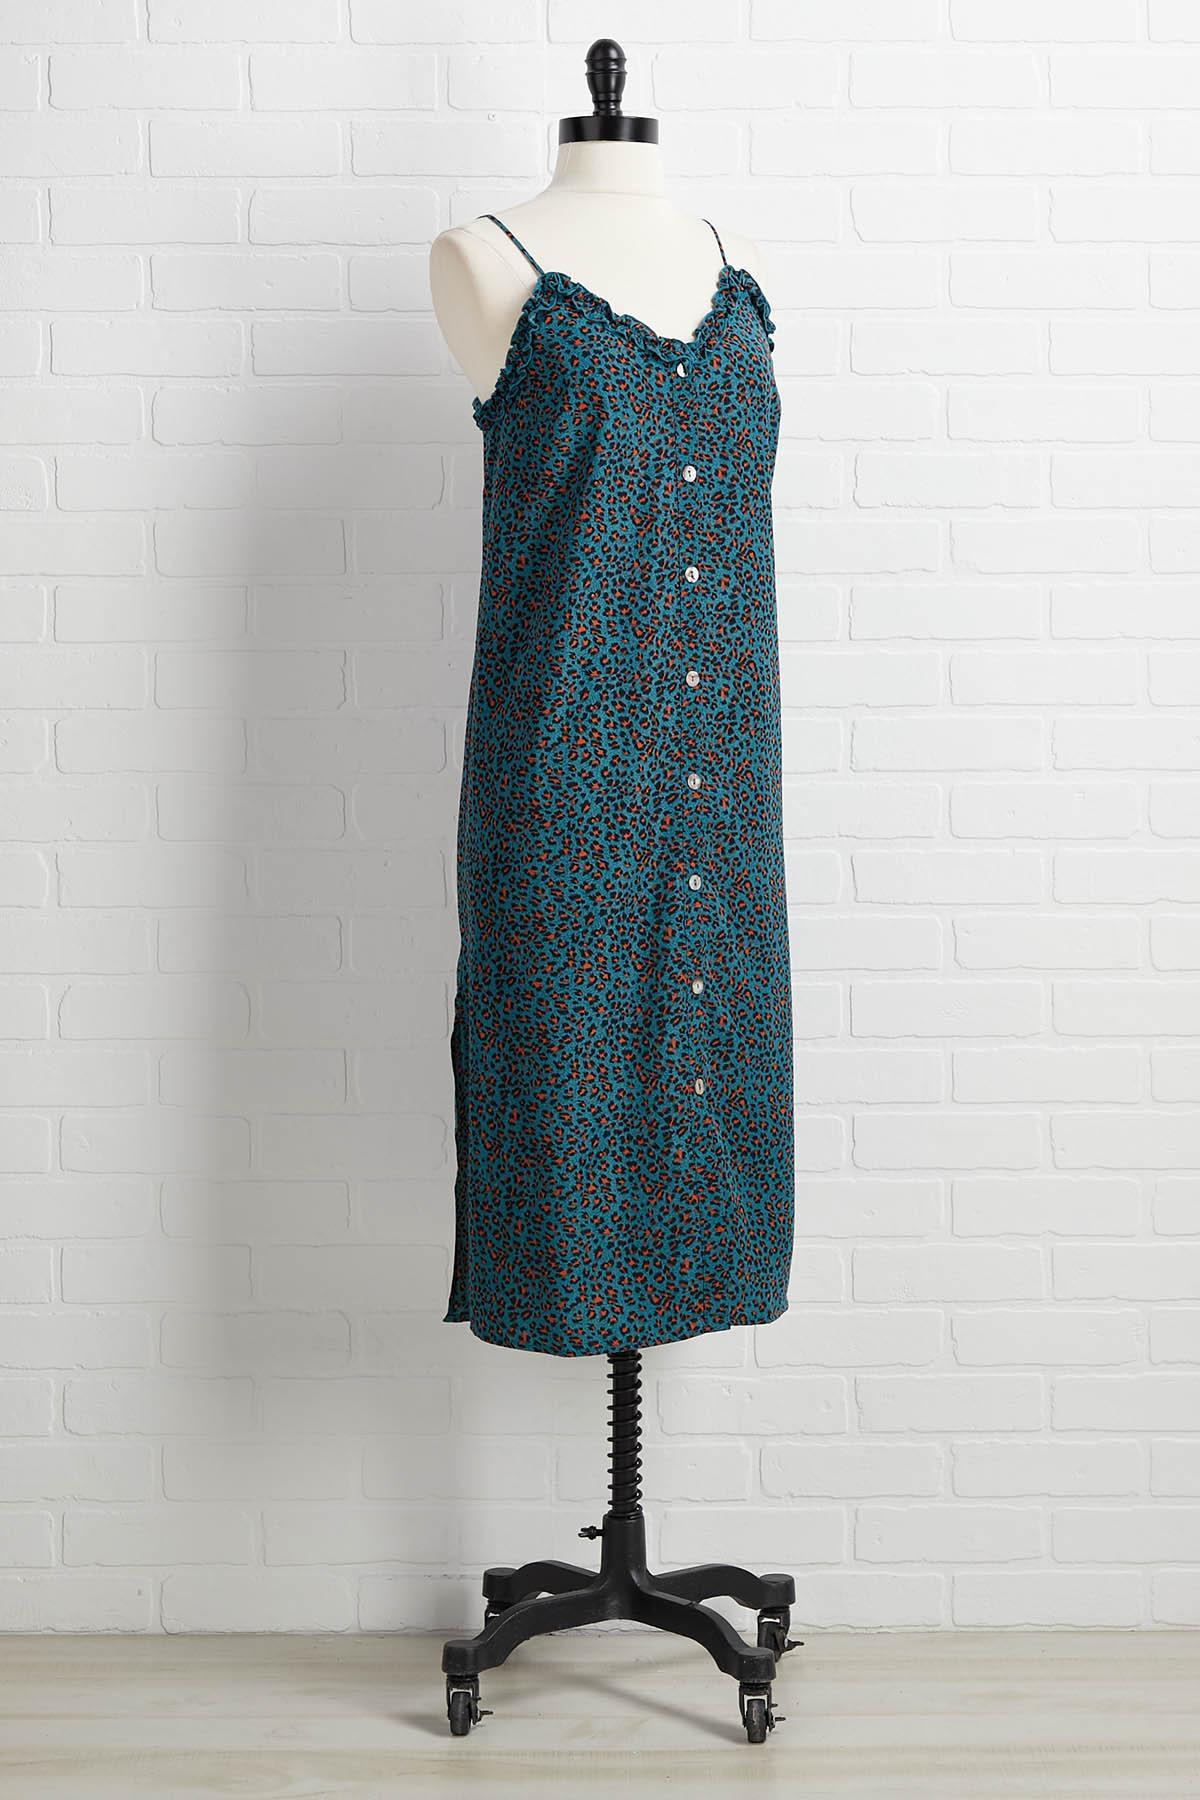 Teal I Say So Dress